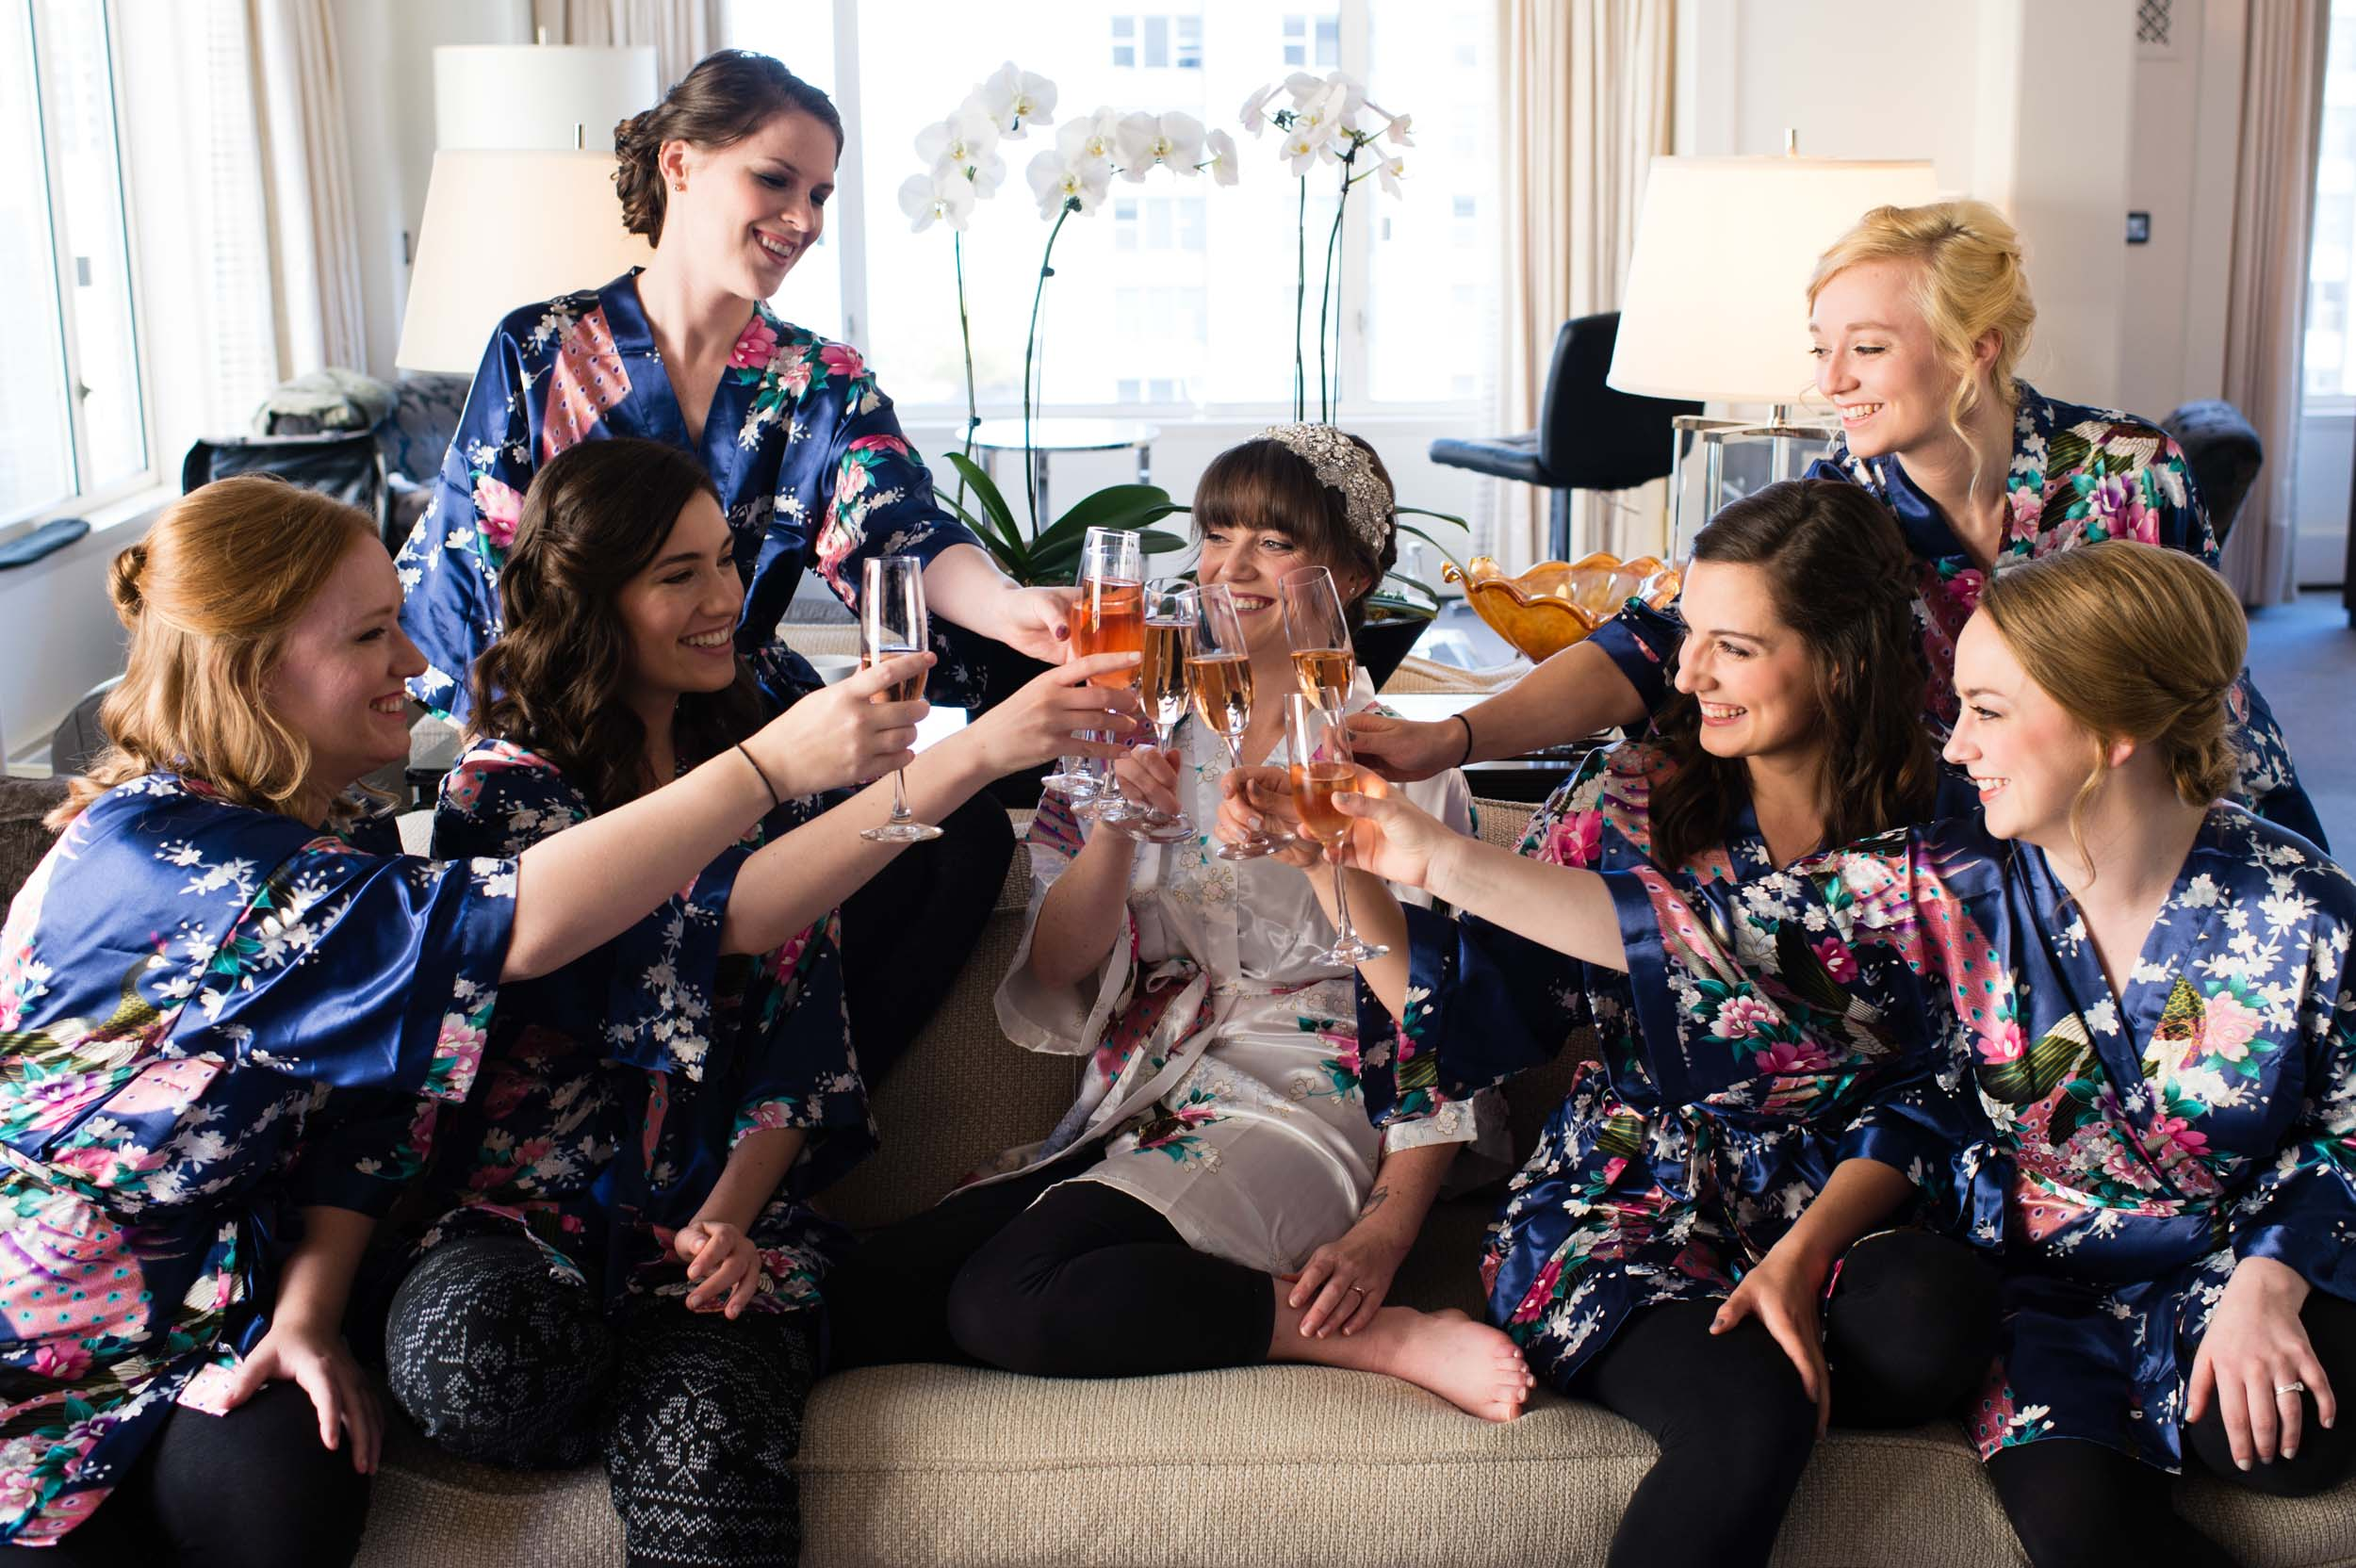 Bride and bridesmaids celebrate wedding morning at Peninsula Hotel Chicago